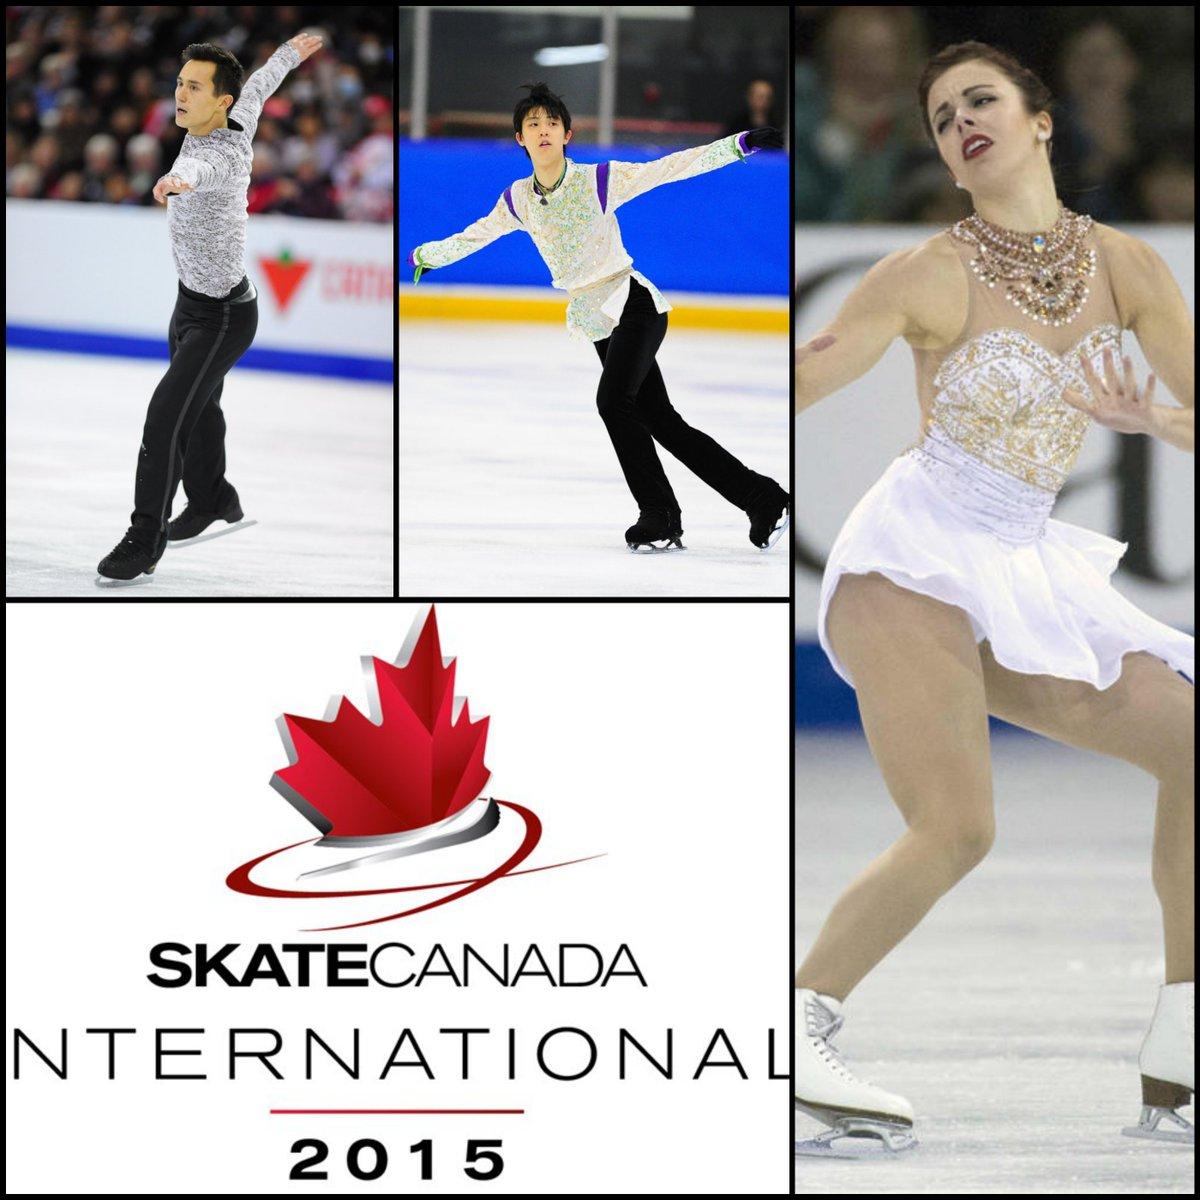 ICE STYLE...Figure Skating Costumes RECAP of #SCI15 @SkateCanada International : https://t.co/BuLLtCYjuB https://t.co/WJyQ6b8LKz